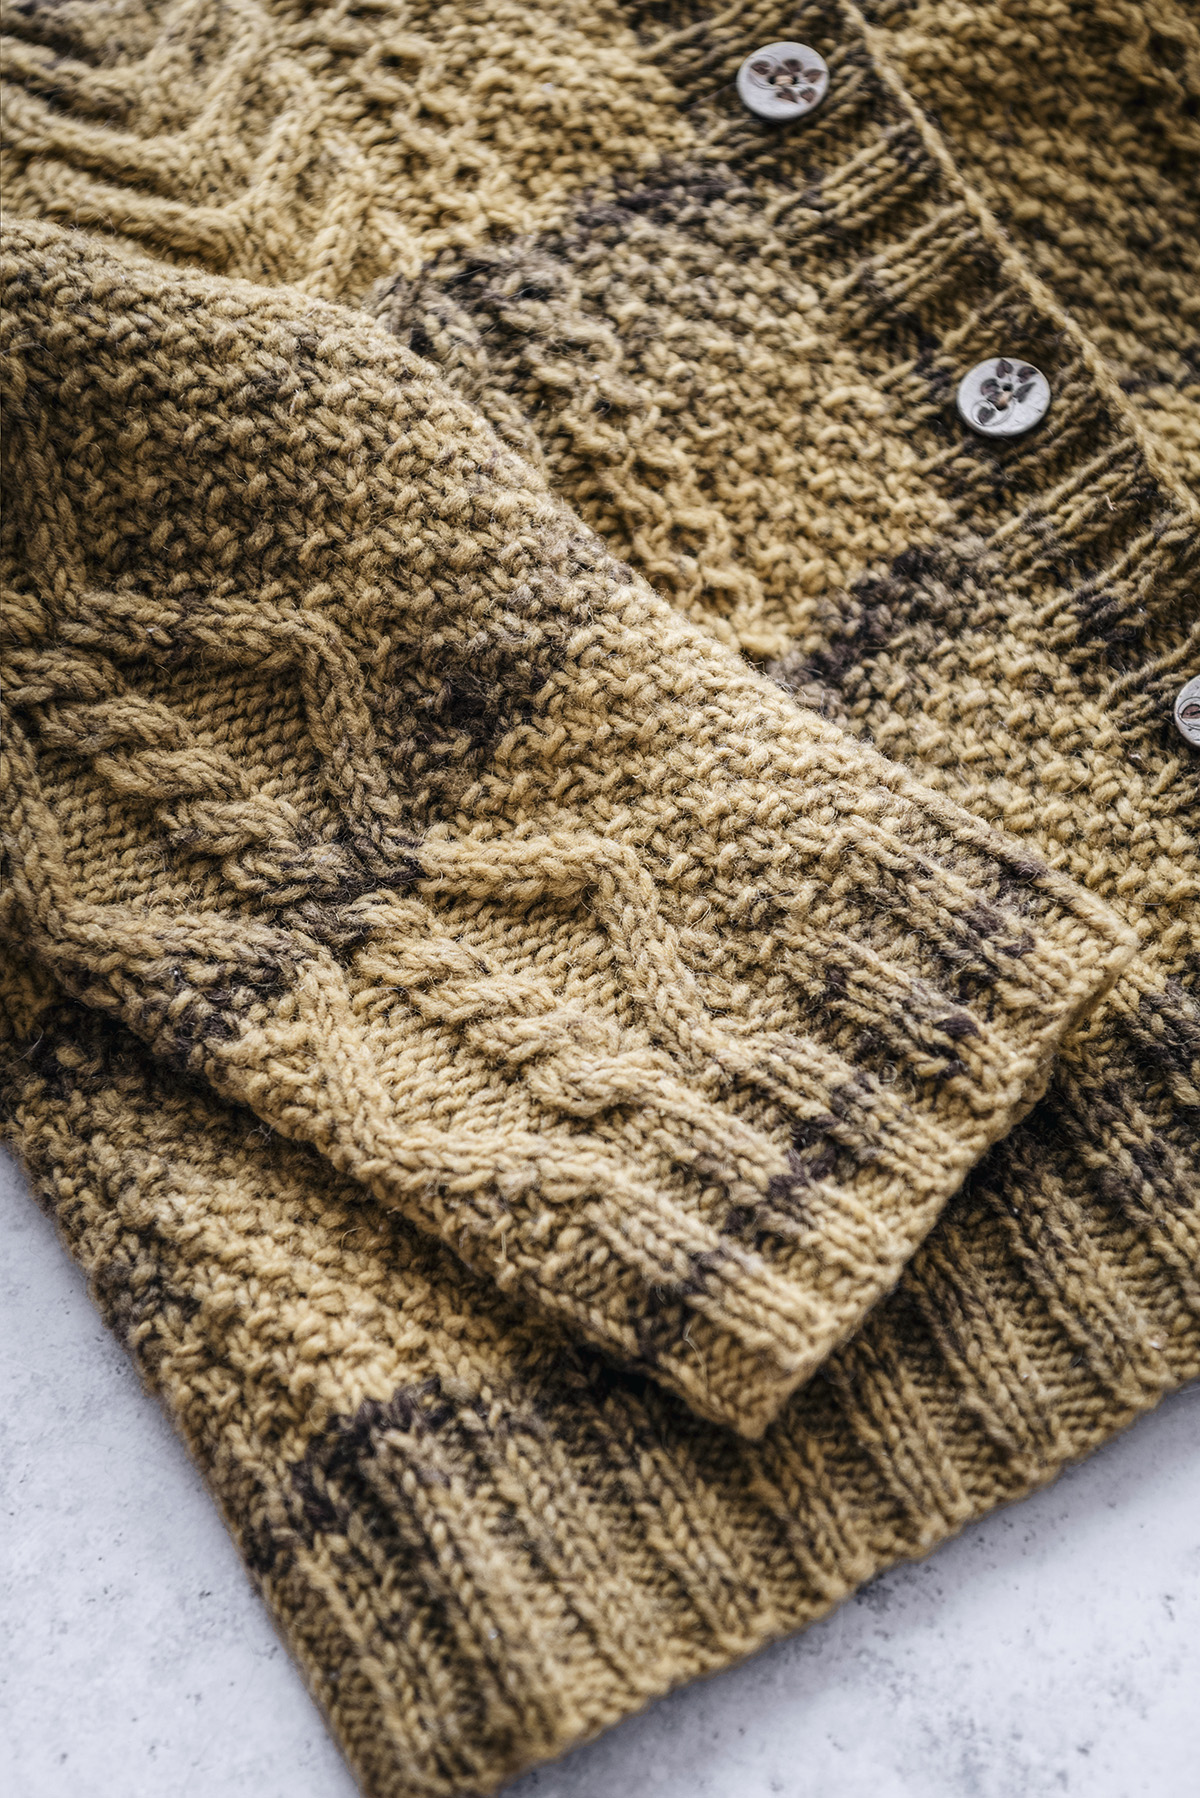 close up Aran knitting cardigan Yoko Hatta Beiroa Portuguese wool Yellowish blog.jpg